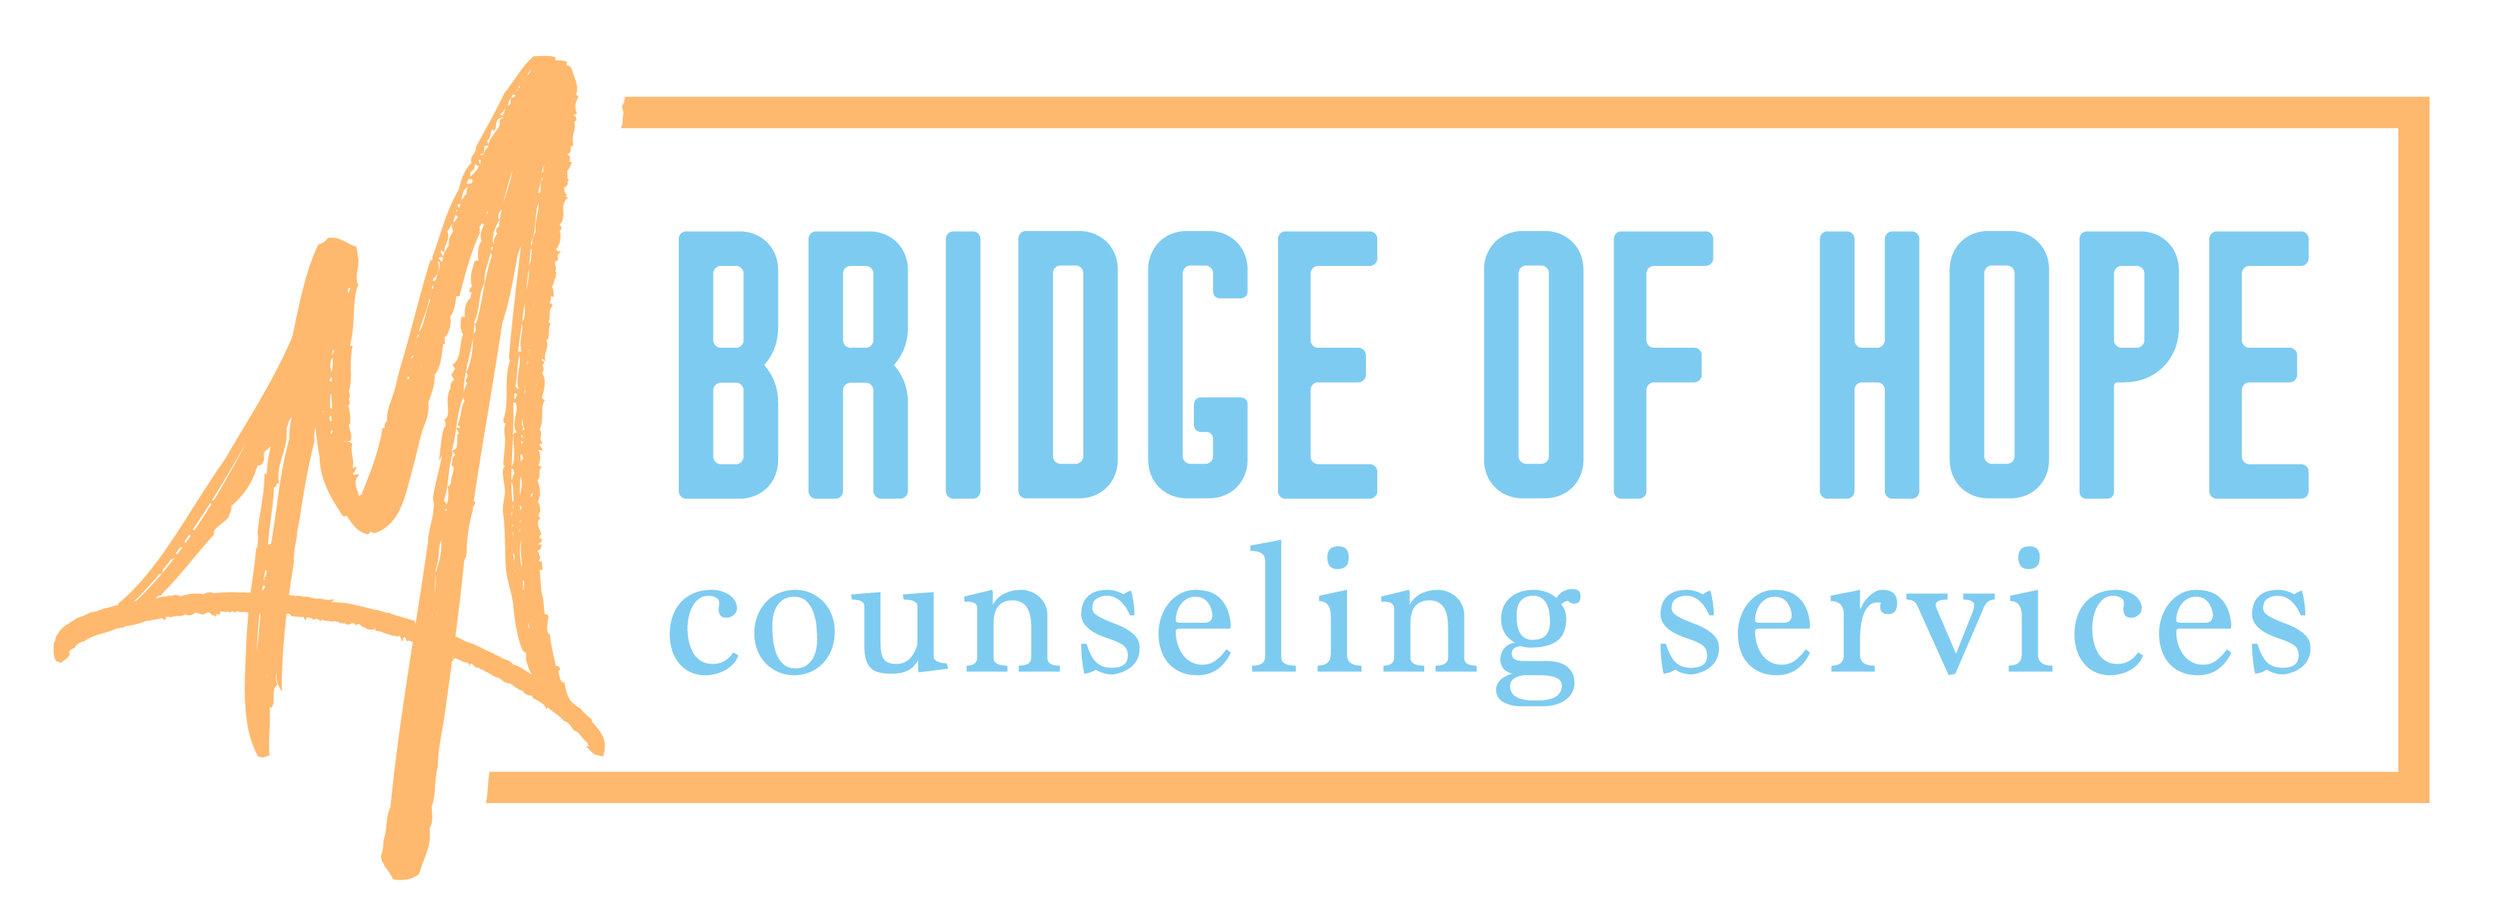 missyrobbsgdp_Logo_Bridge_of_Hope_Counseling_Services.jpg